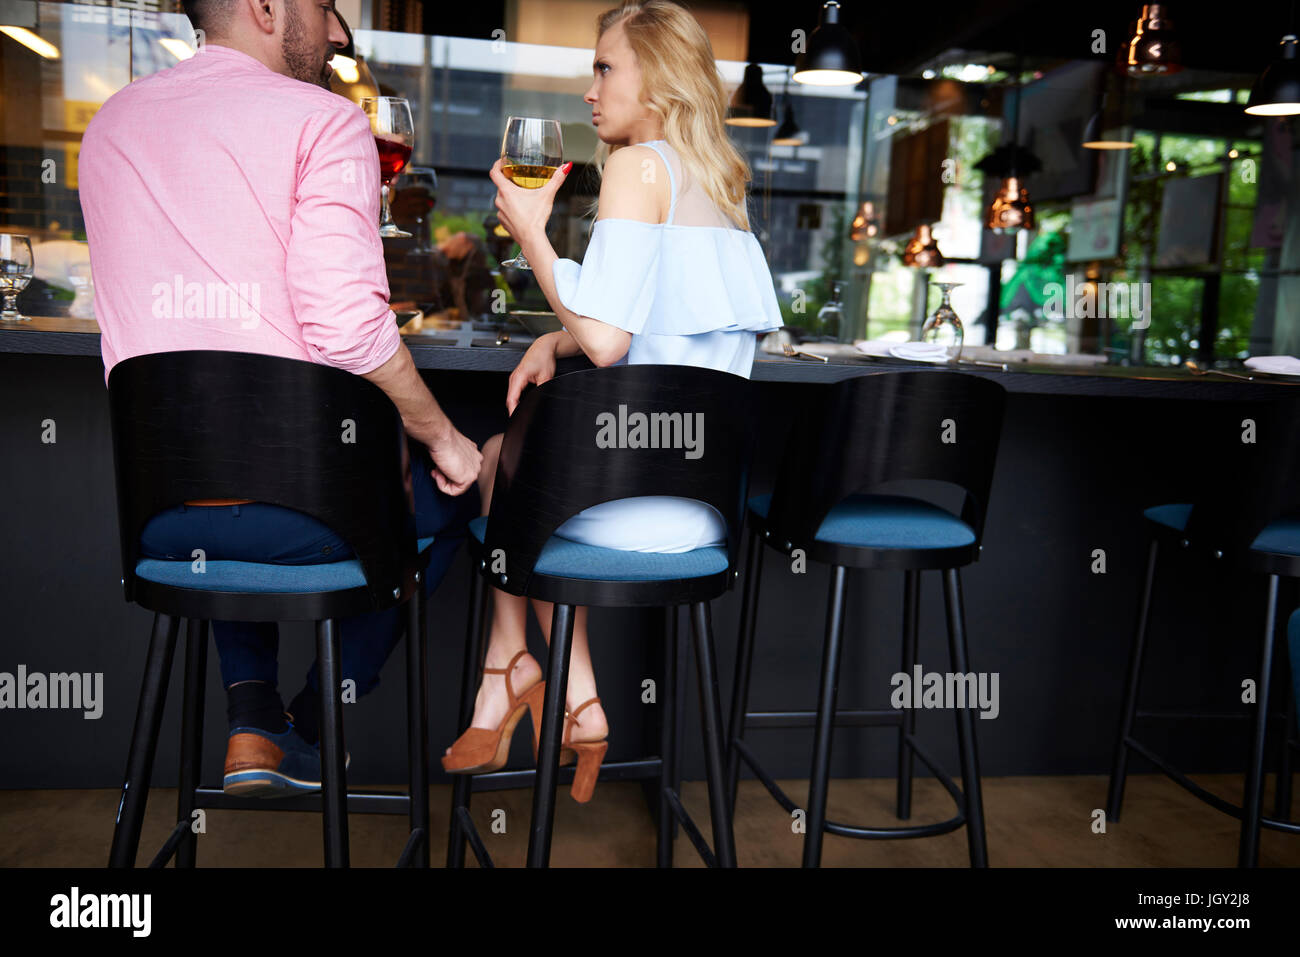 Rückansicht des Menschen berühren böse junge Frau Knie bei Bar Stockbild